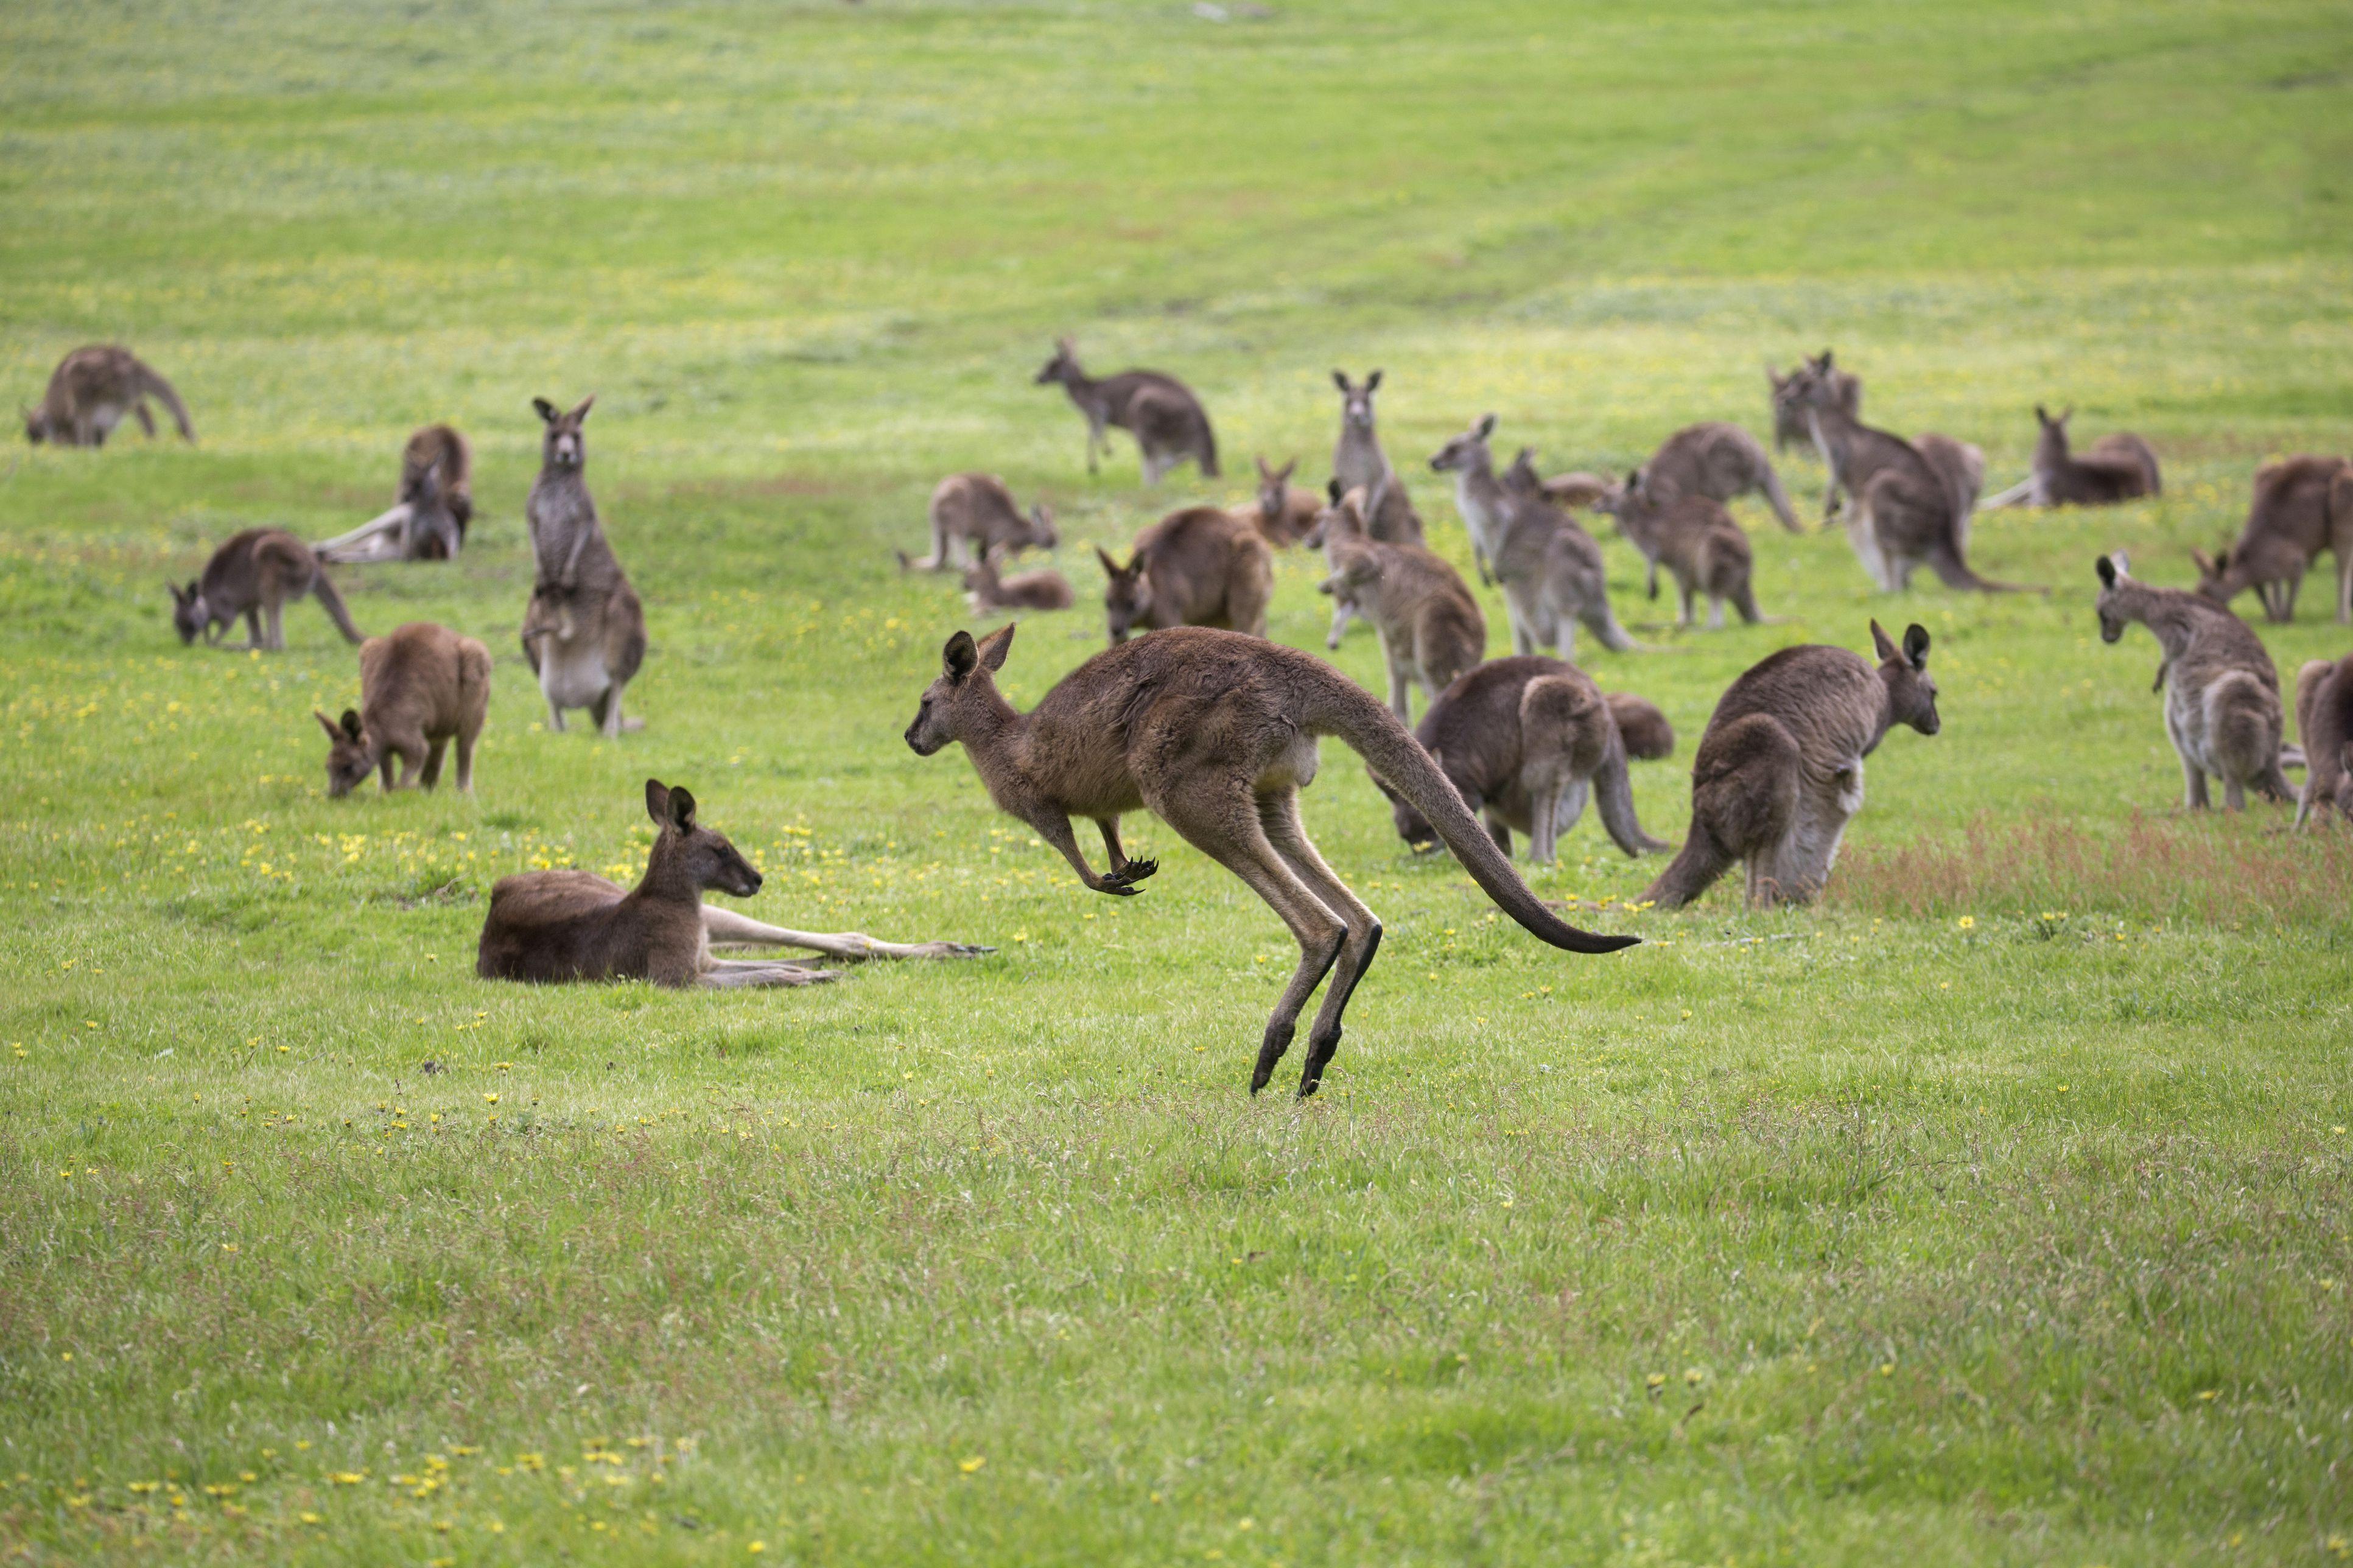 Wild kangaroos in green field.